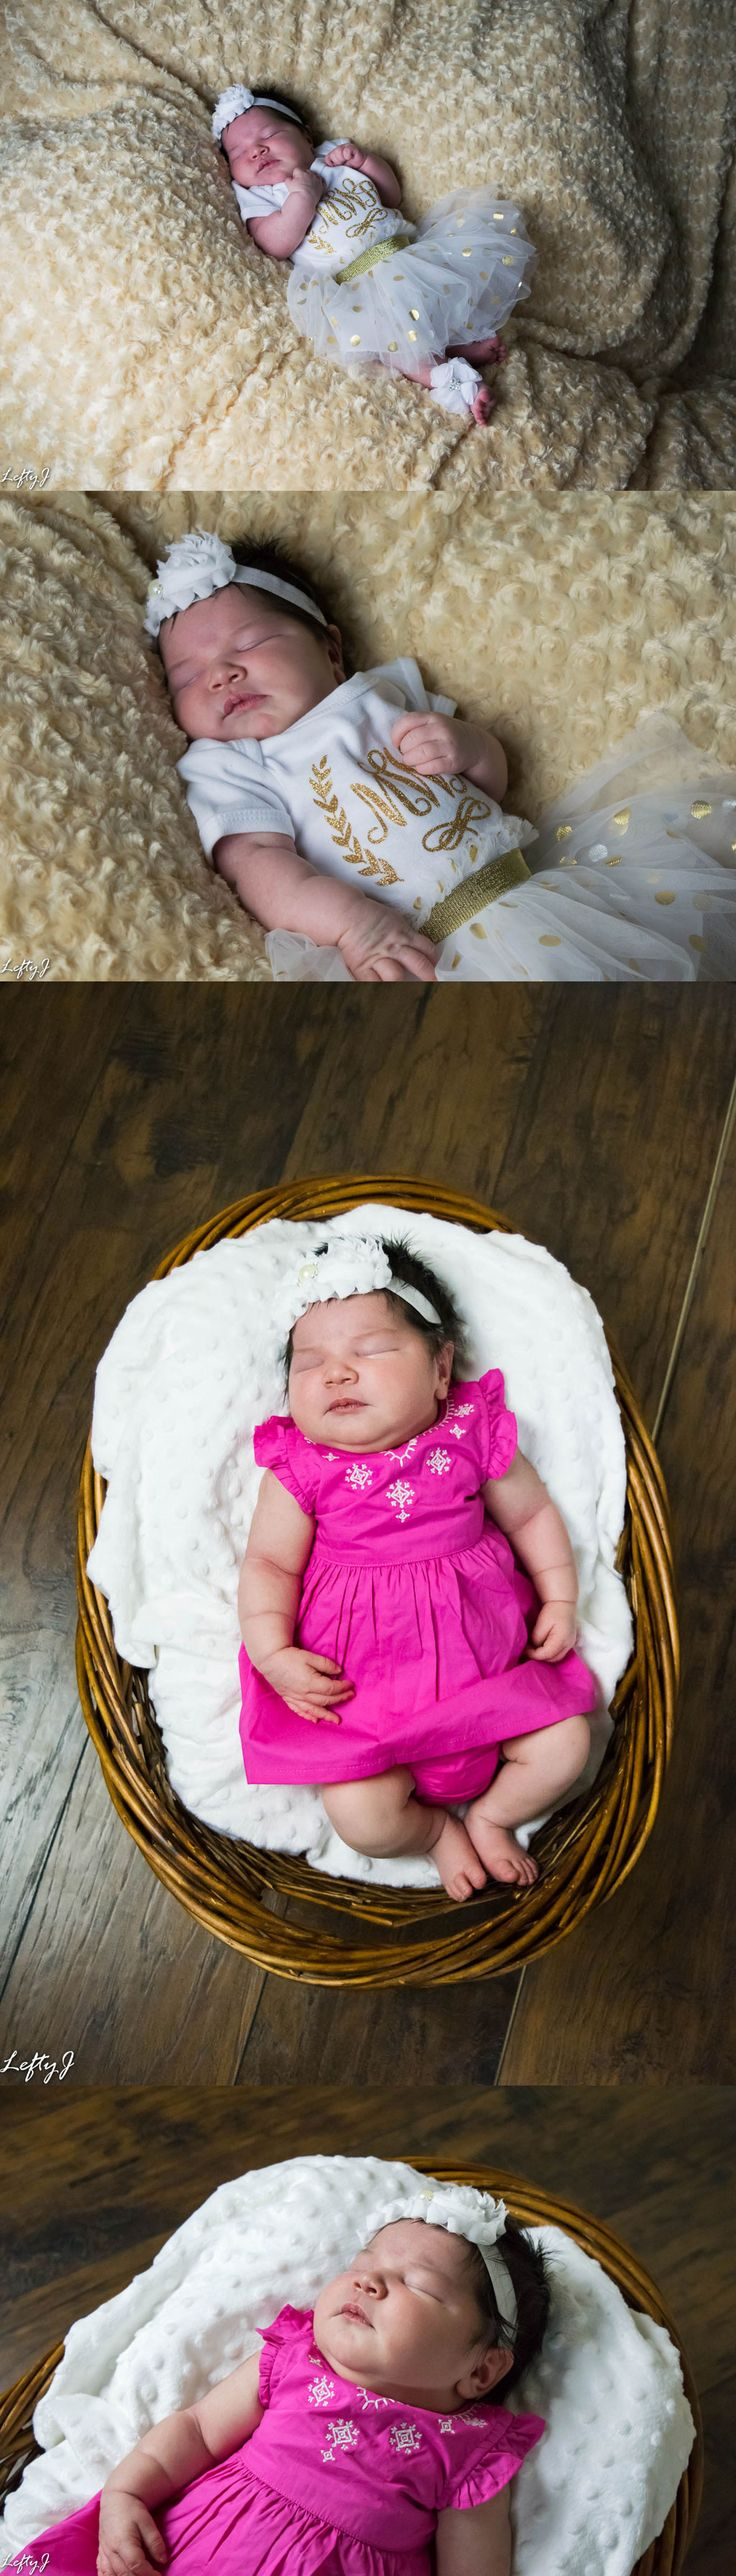 Newborn baby photography by Lefty J Photography, Corpus Christi, TX. #babyphotography #babyphotos #newborn #newbornphotos #newbornphotography #corpuschristi #corpuschristiphotography #corpuschristiphotographer #sinton #sintontx #sintonpirates #sintonphotography #sintonphotographer